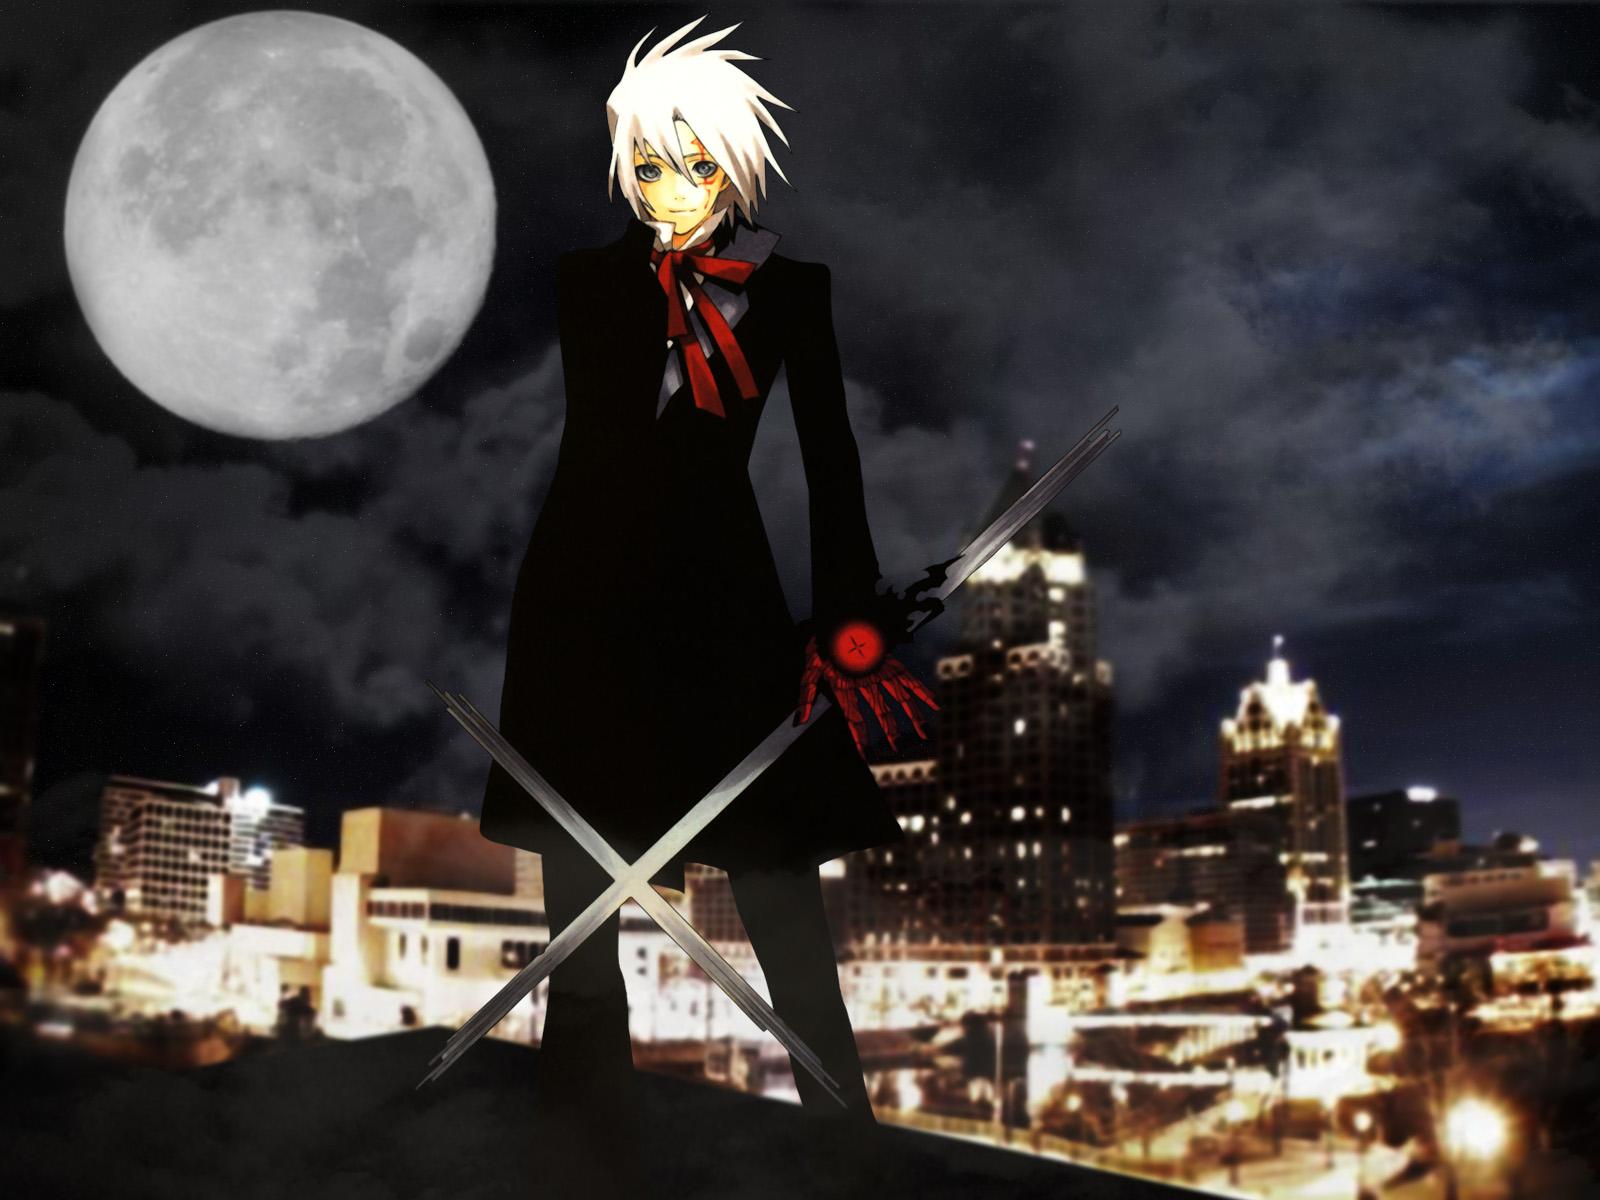 http://2.bp.blogspot.com/_Se7QlrIDzoM/TQbwE_50a8I/AAAAAAAAAE4/GtLLBmsiy4g/s1600/anime_dark_gothic_boy__0030.jpg